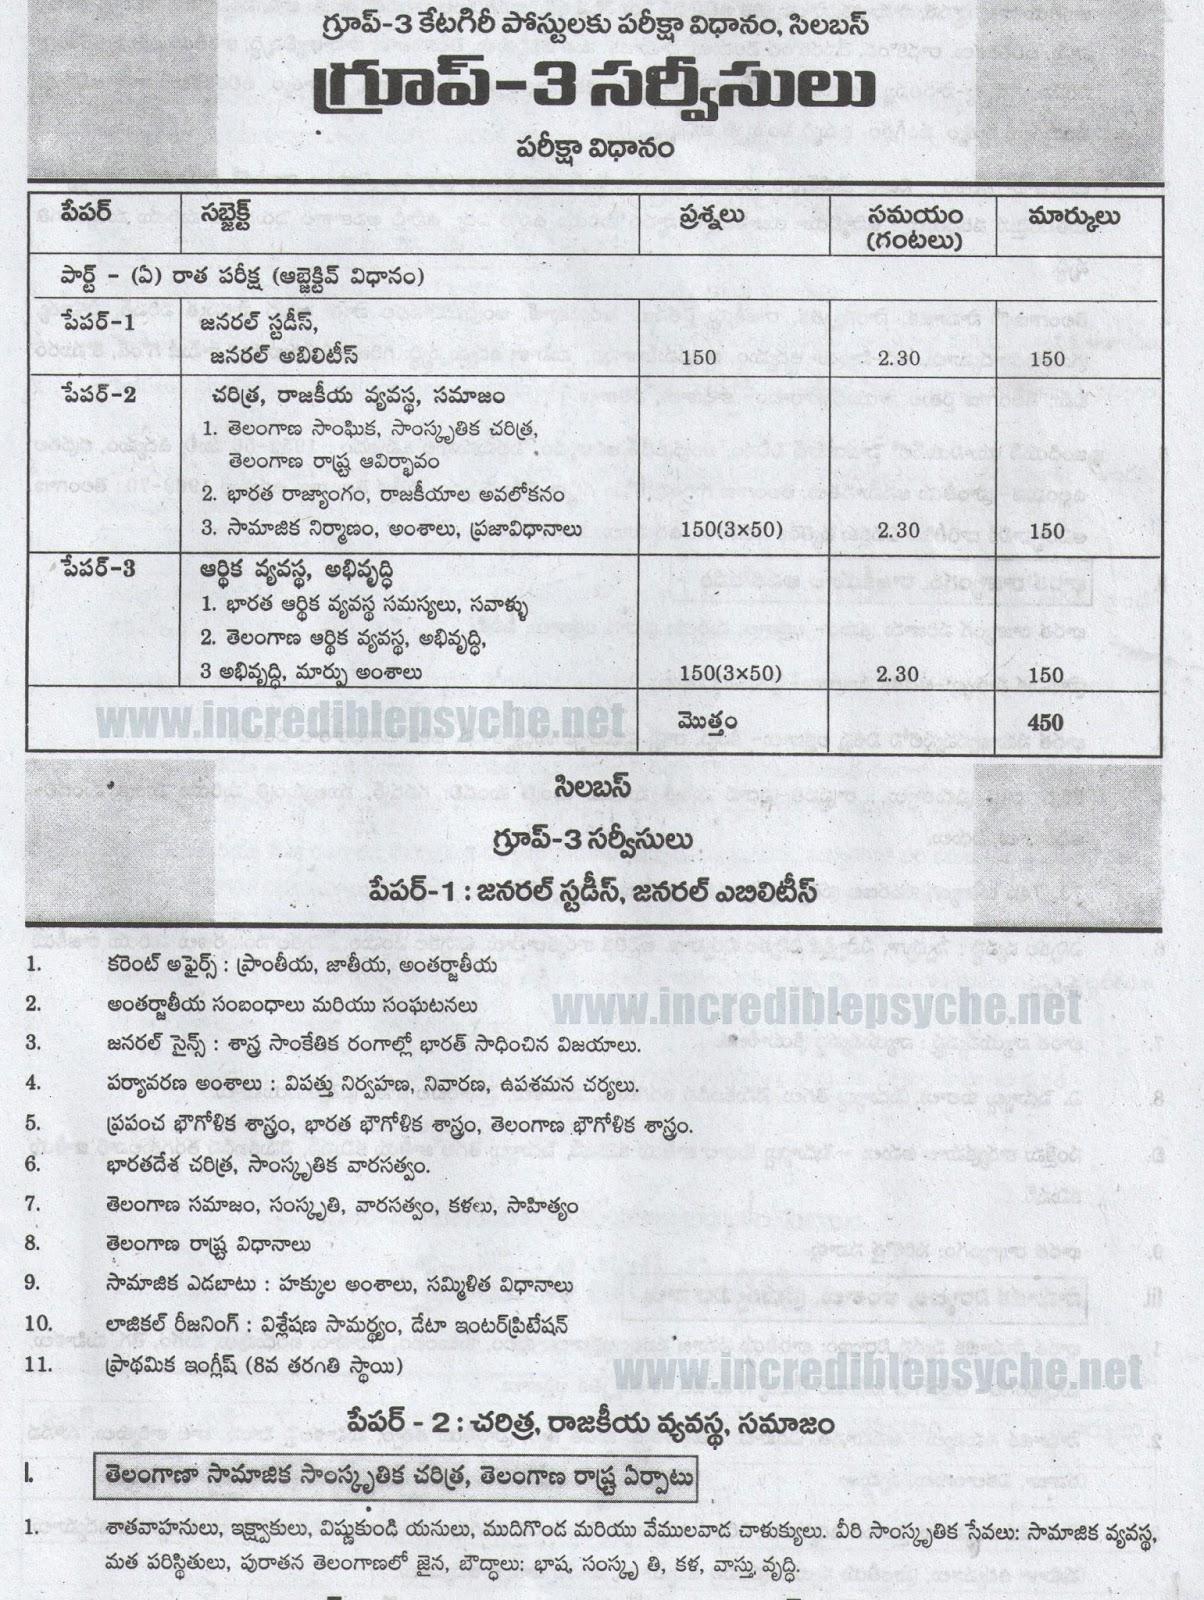 telangana tspsc group 3 exam syllabus in telugu with scheme of exam pattern detailed pattern